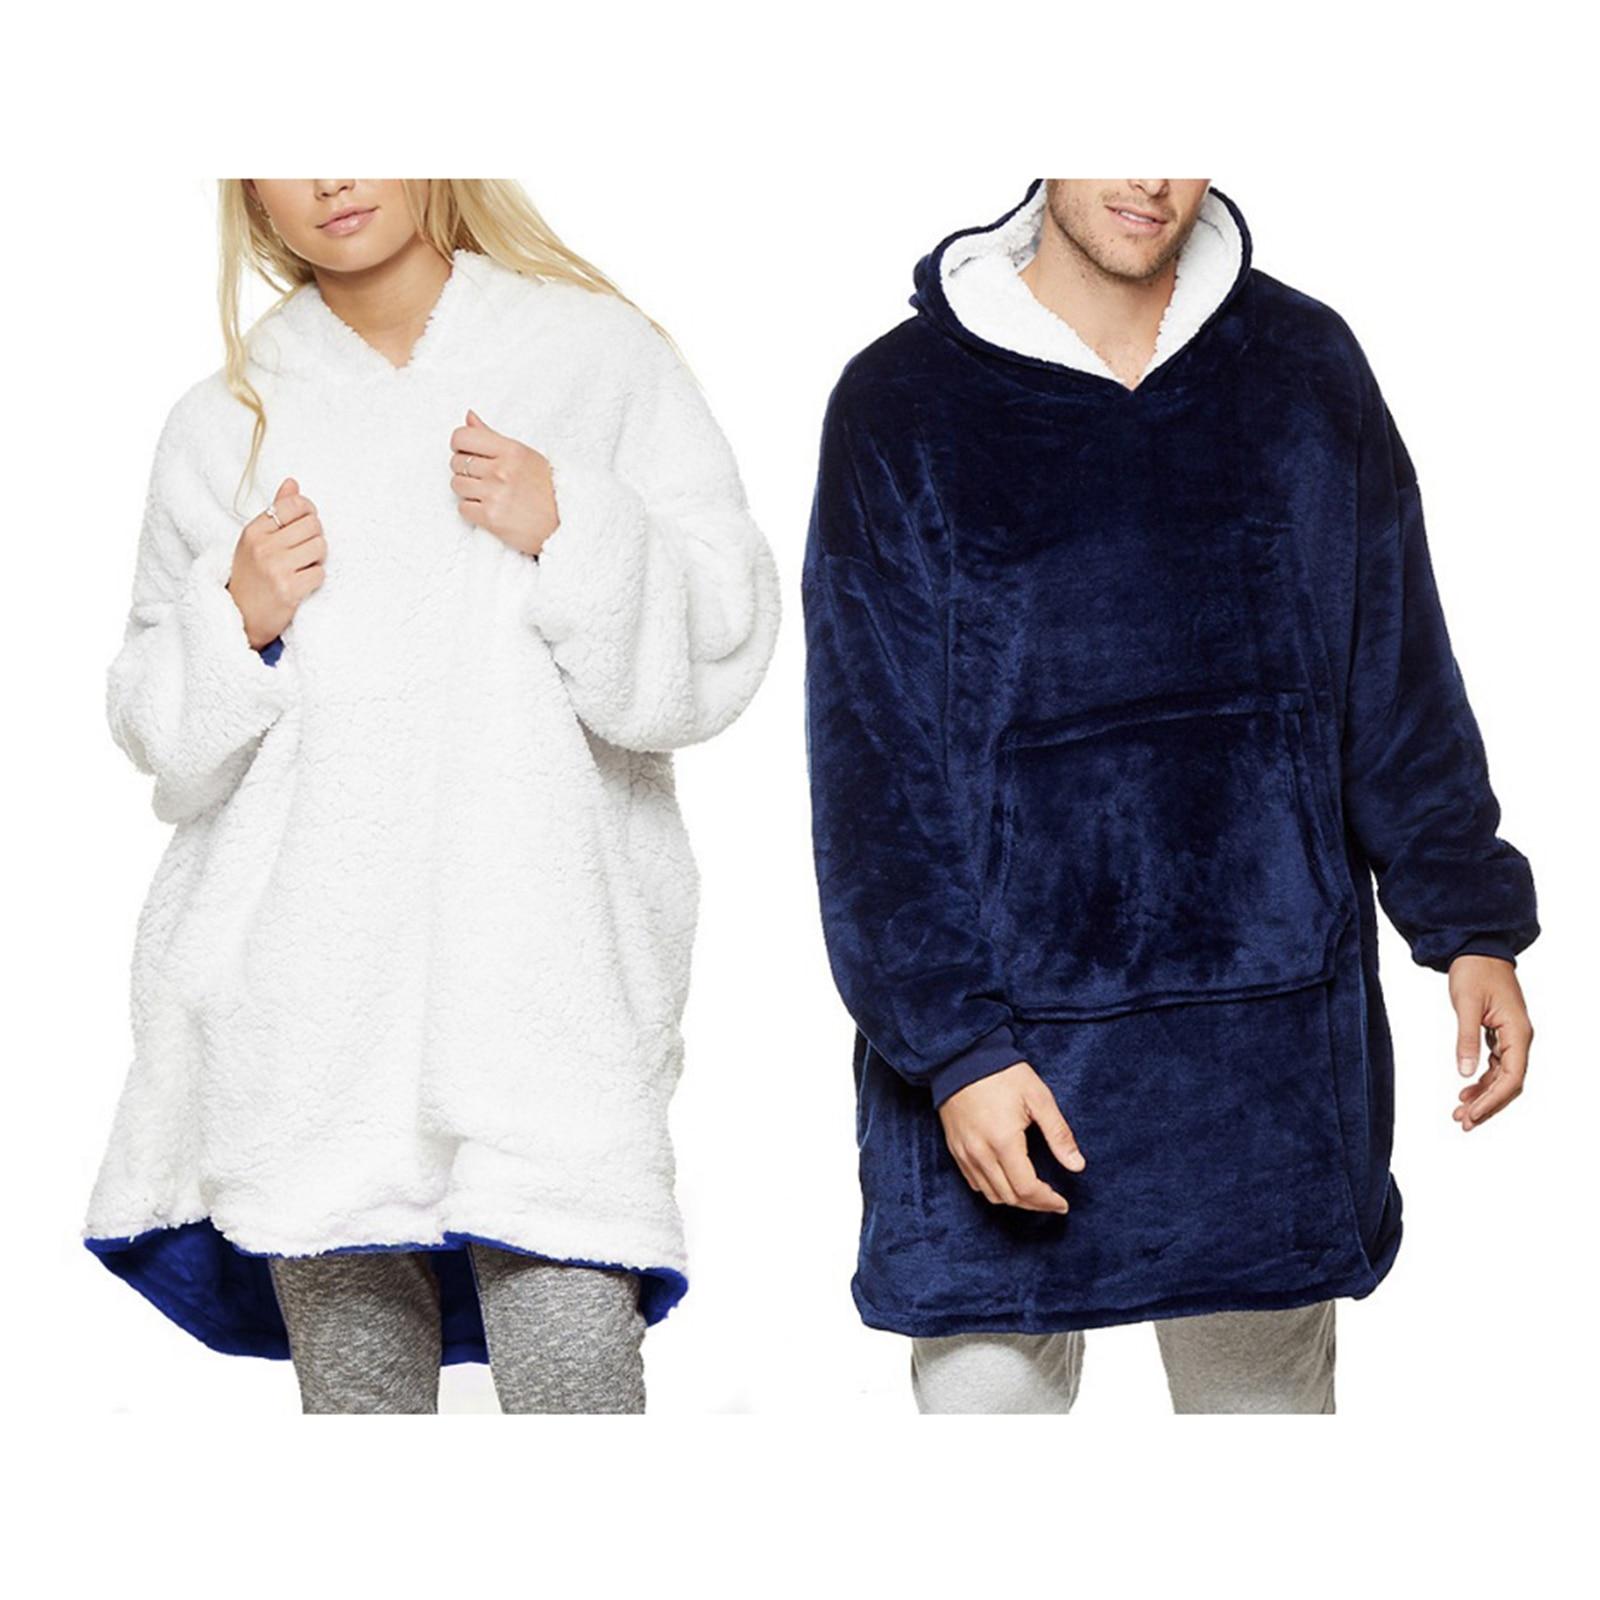 Hoodie Comfy Bathrobe Nightwear Fleece-Blanket Wearable Mountains Picnics Climbing Super-Soft